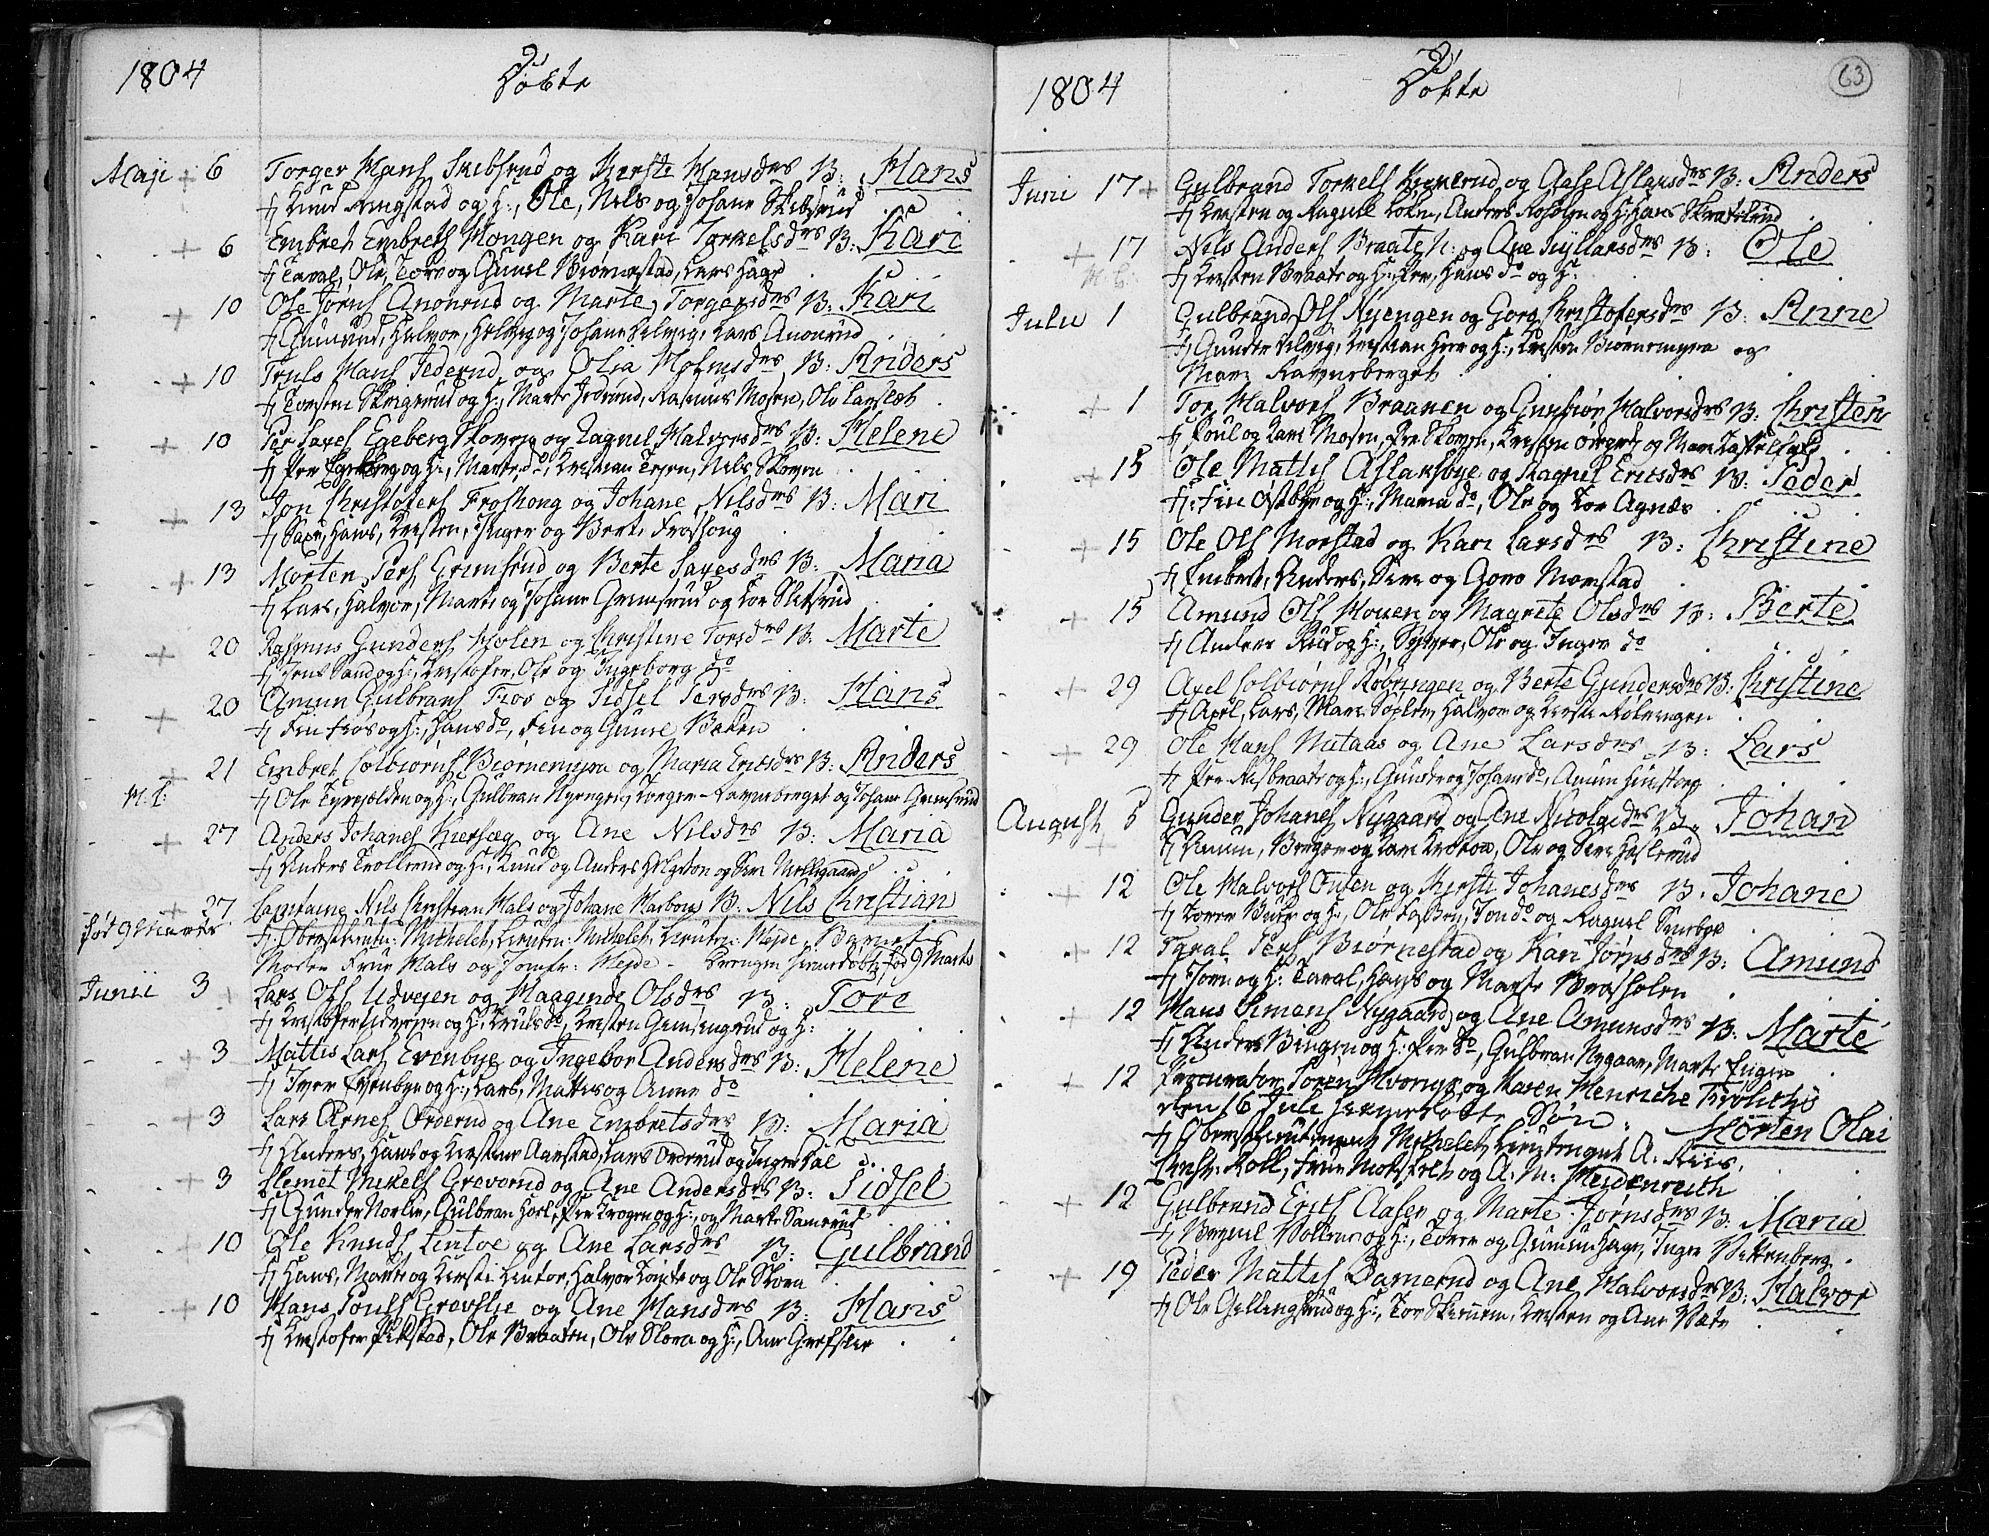 SAO, Trøgstad prestekontor Kirkebøker, F/Fa/L0005: Ministerialbok nr. I 5, 1784-1814, s. 63